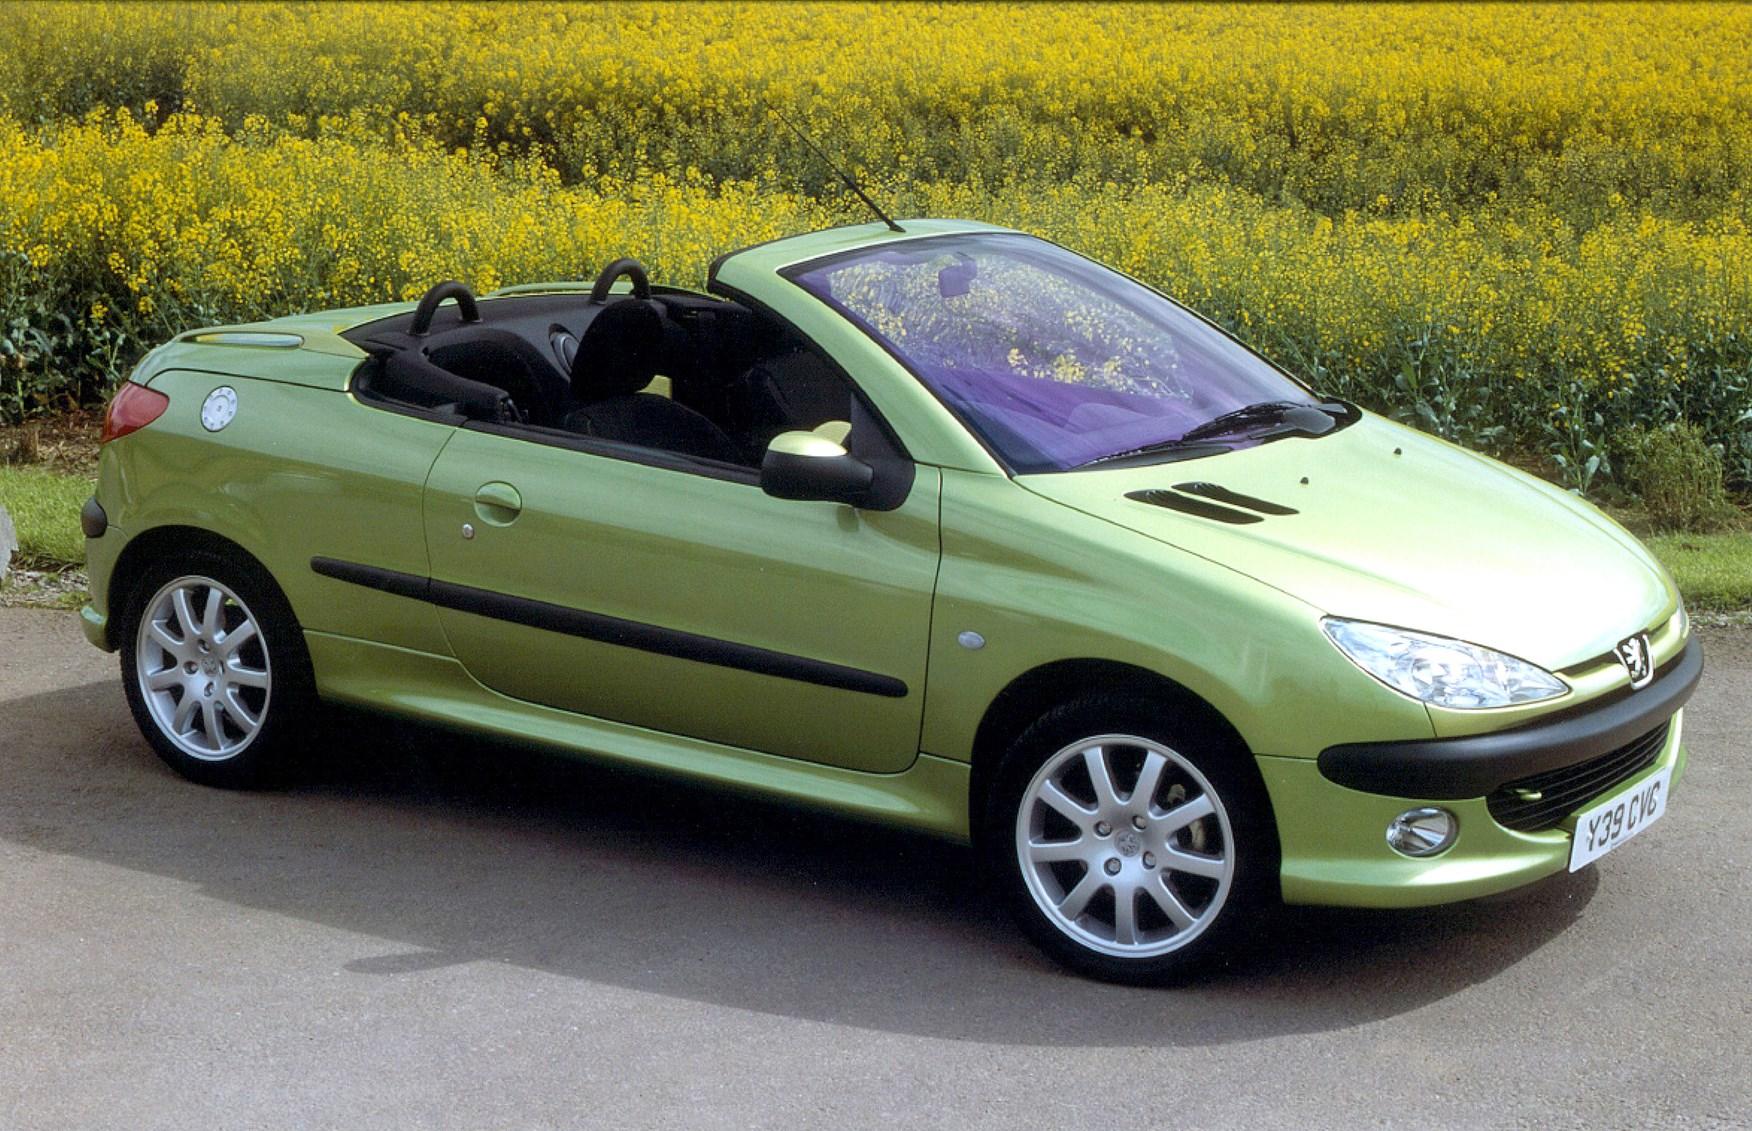 peugeot 206 coup cabriolet review 2001 2007 parkers. Black Bedroom Furniture Sets. Home Design Ideas